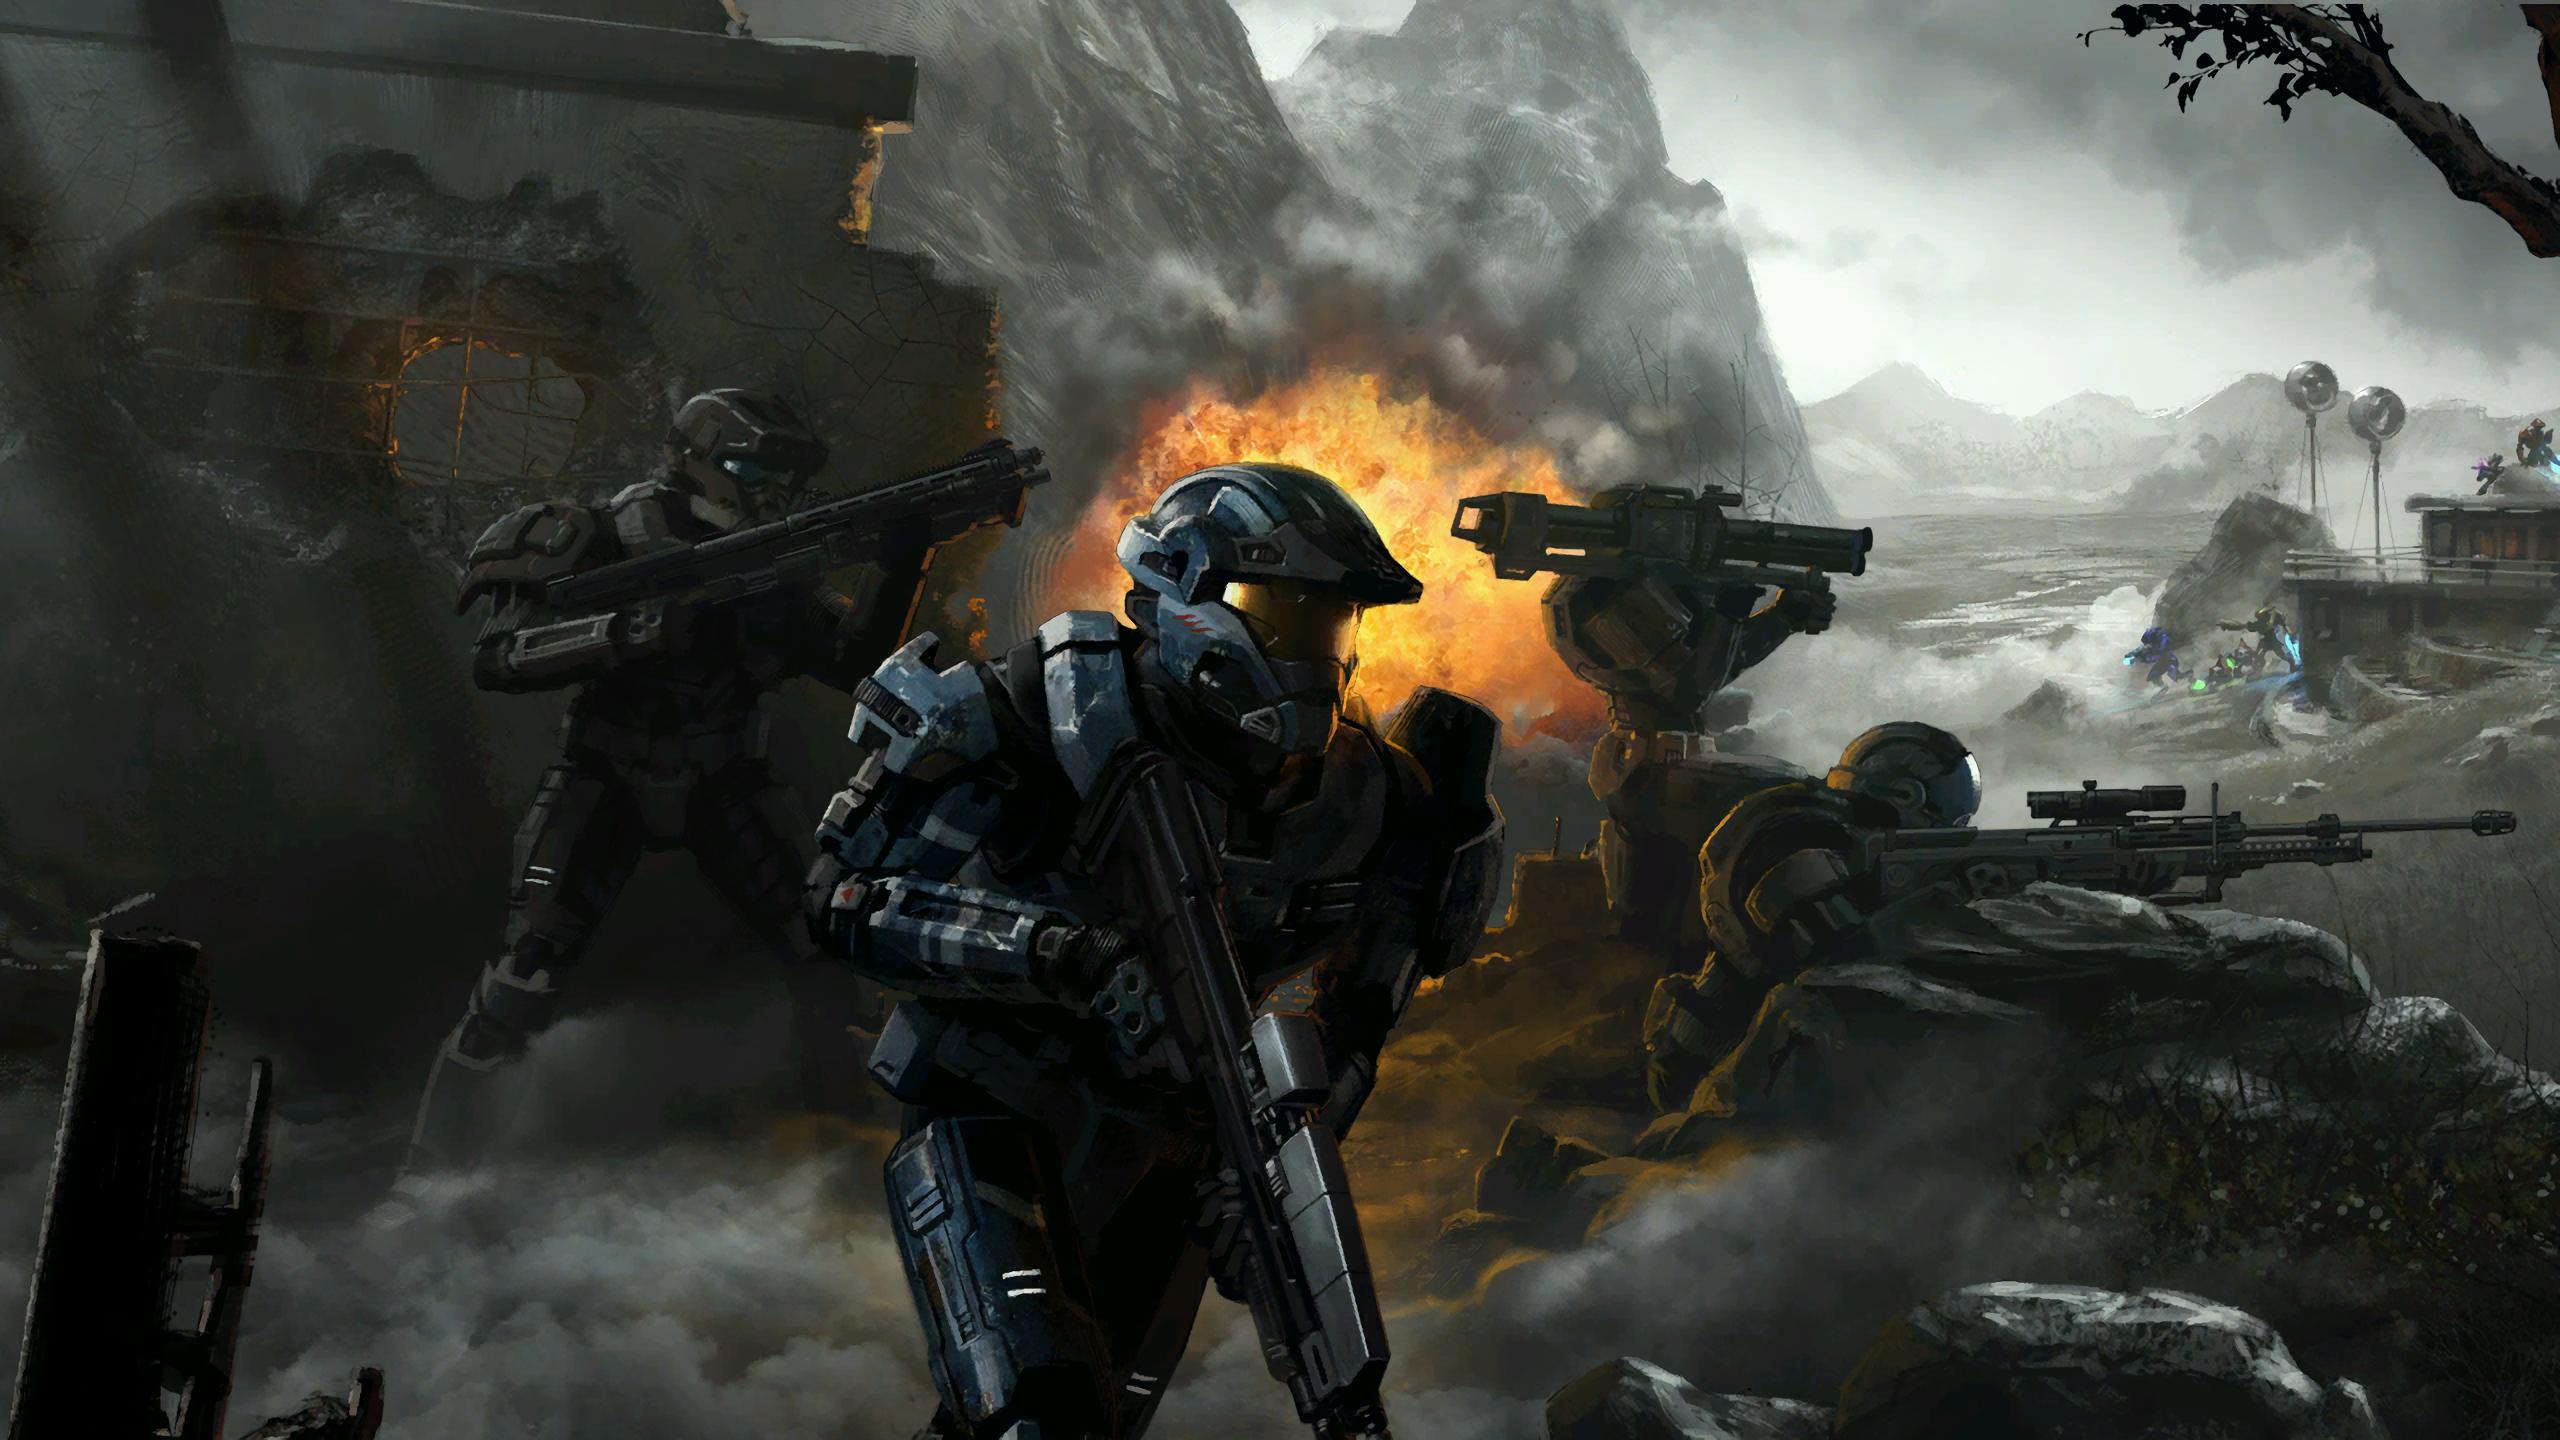 General 2560x1440 Halo Spartans Xbox video game art Halo 3 Halo Reach science fiction Covenant Elite explosion sniper rifle rocket launchers shotgun combat firefight